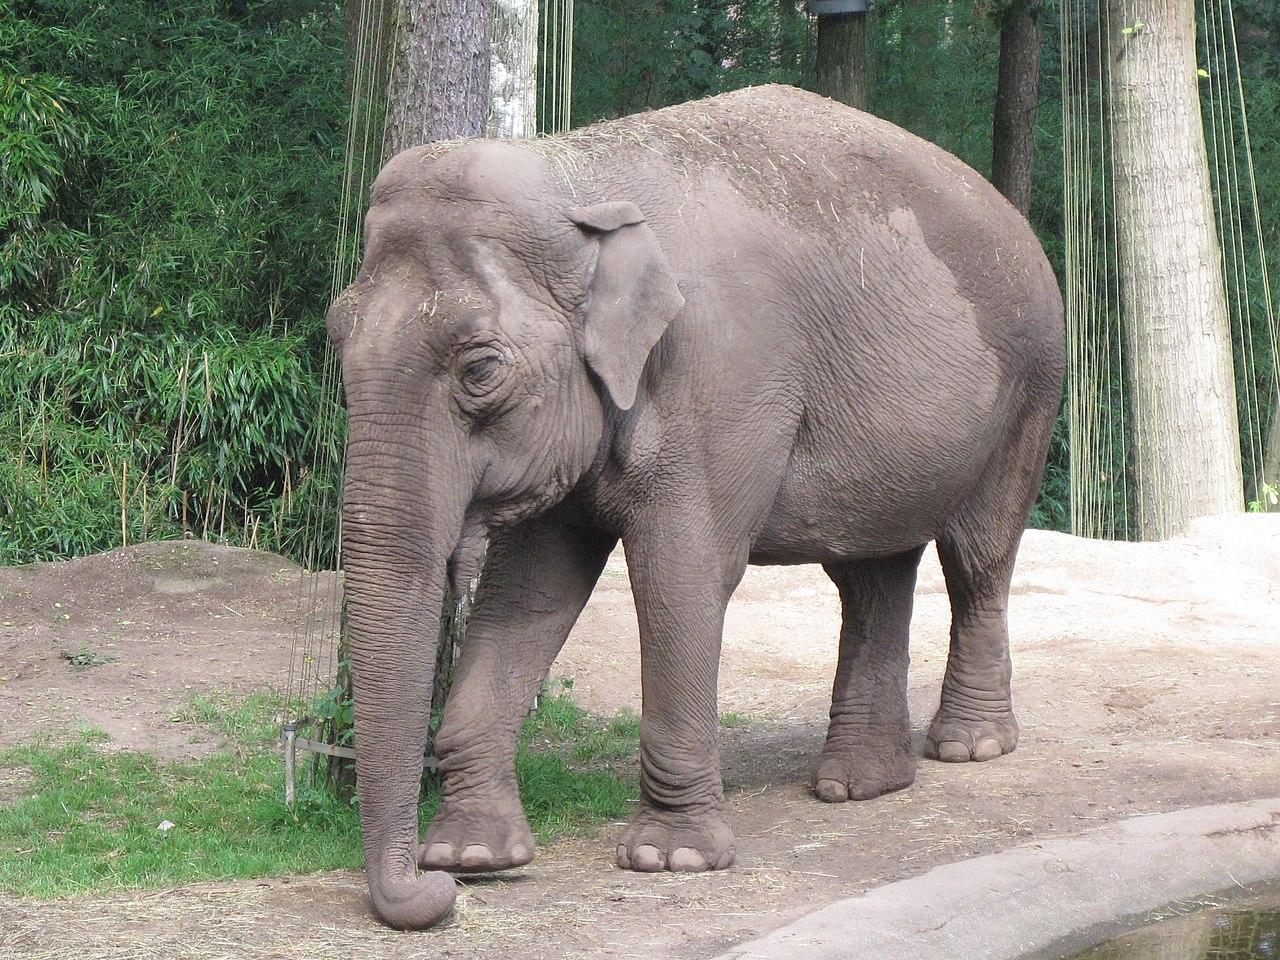 File:Elephas maximus (Asiatic elephant), Burgers zoo, Arnhem, the ...